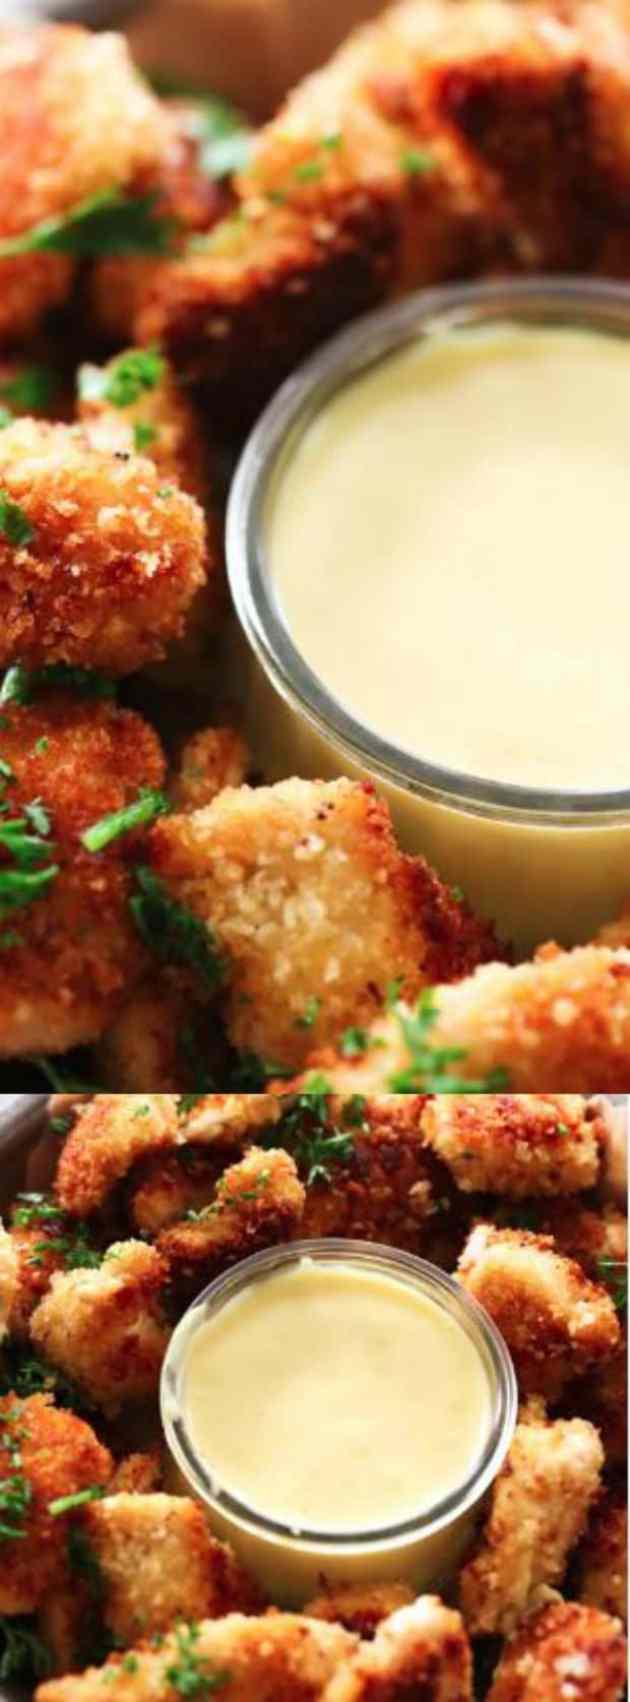 Homemade Chicken Nuggets Longpin